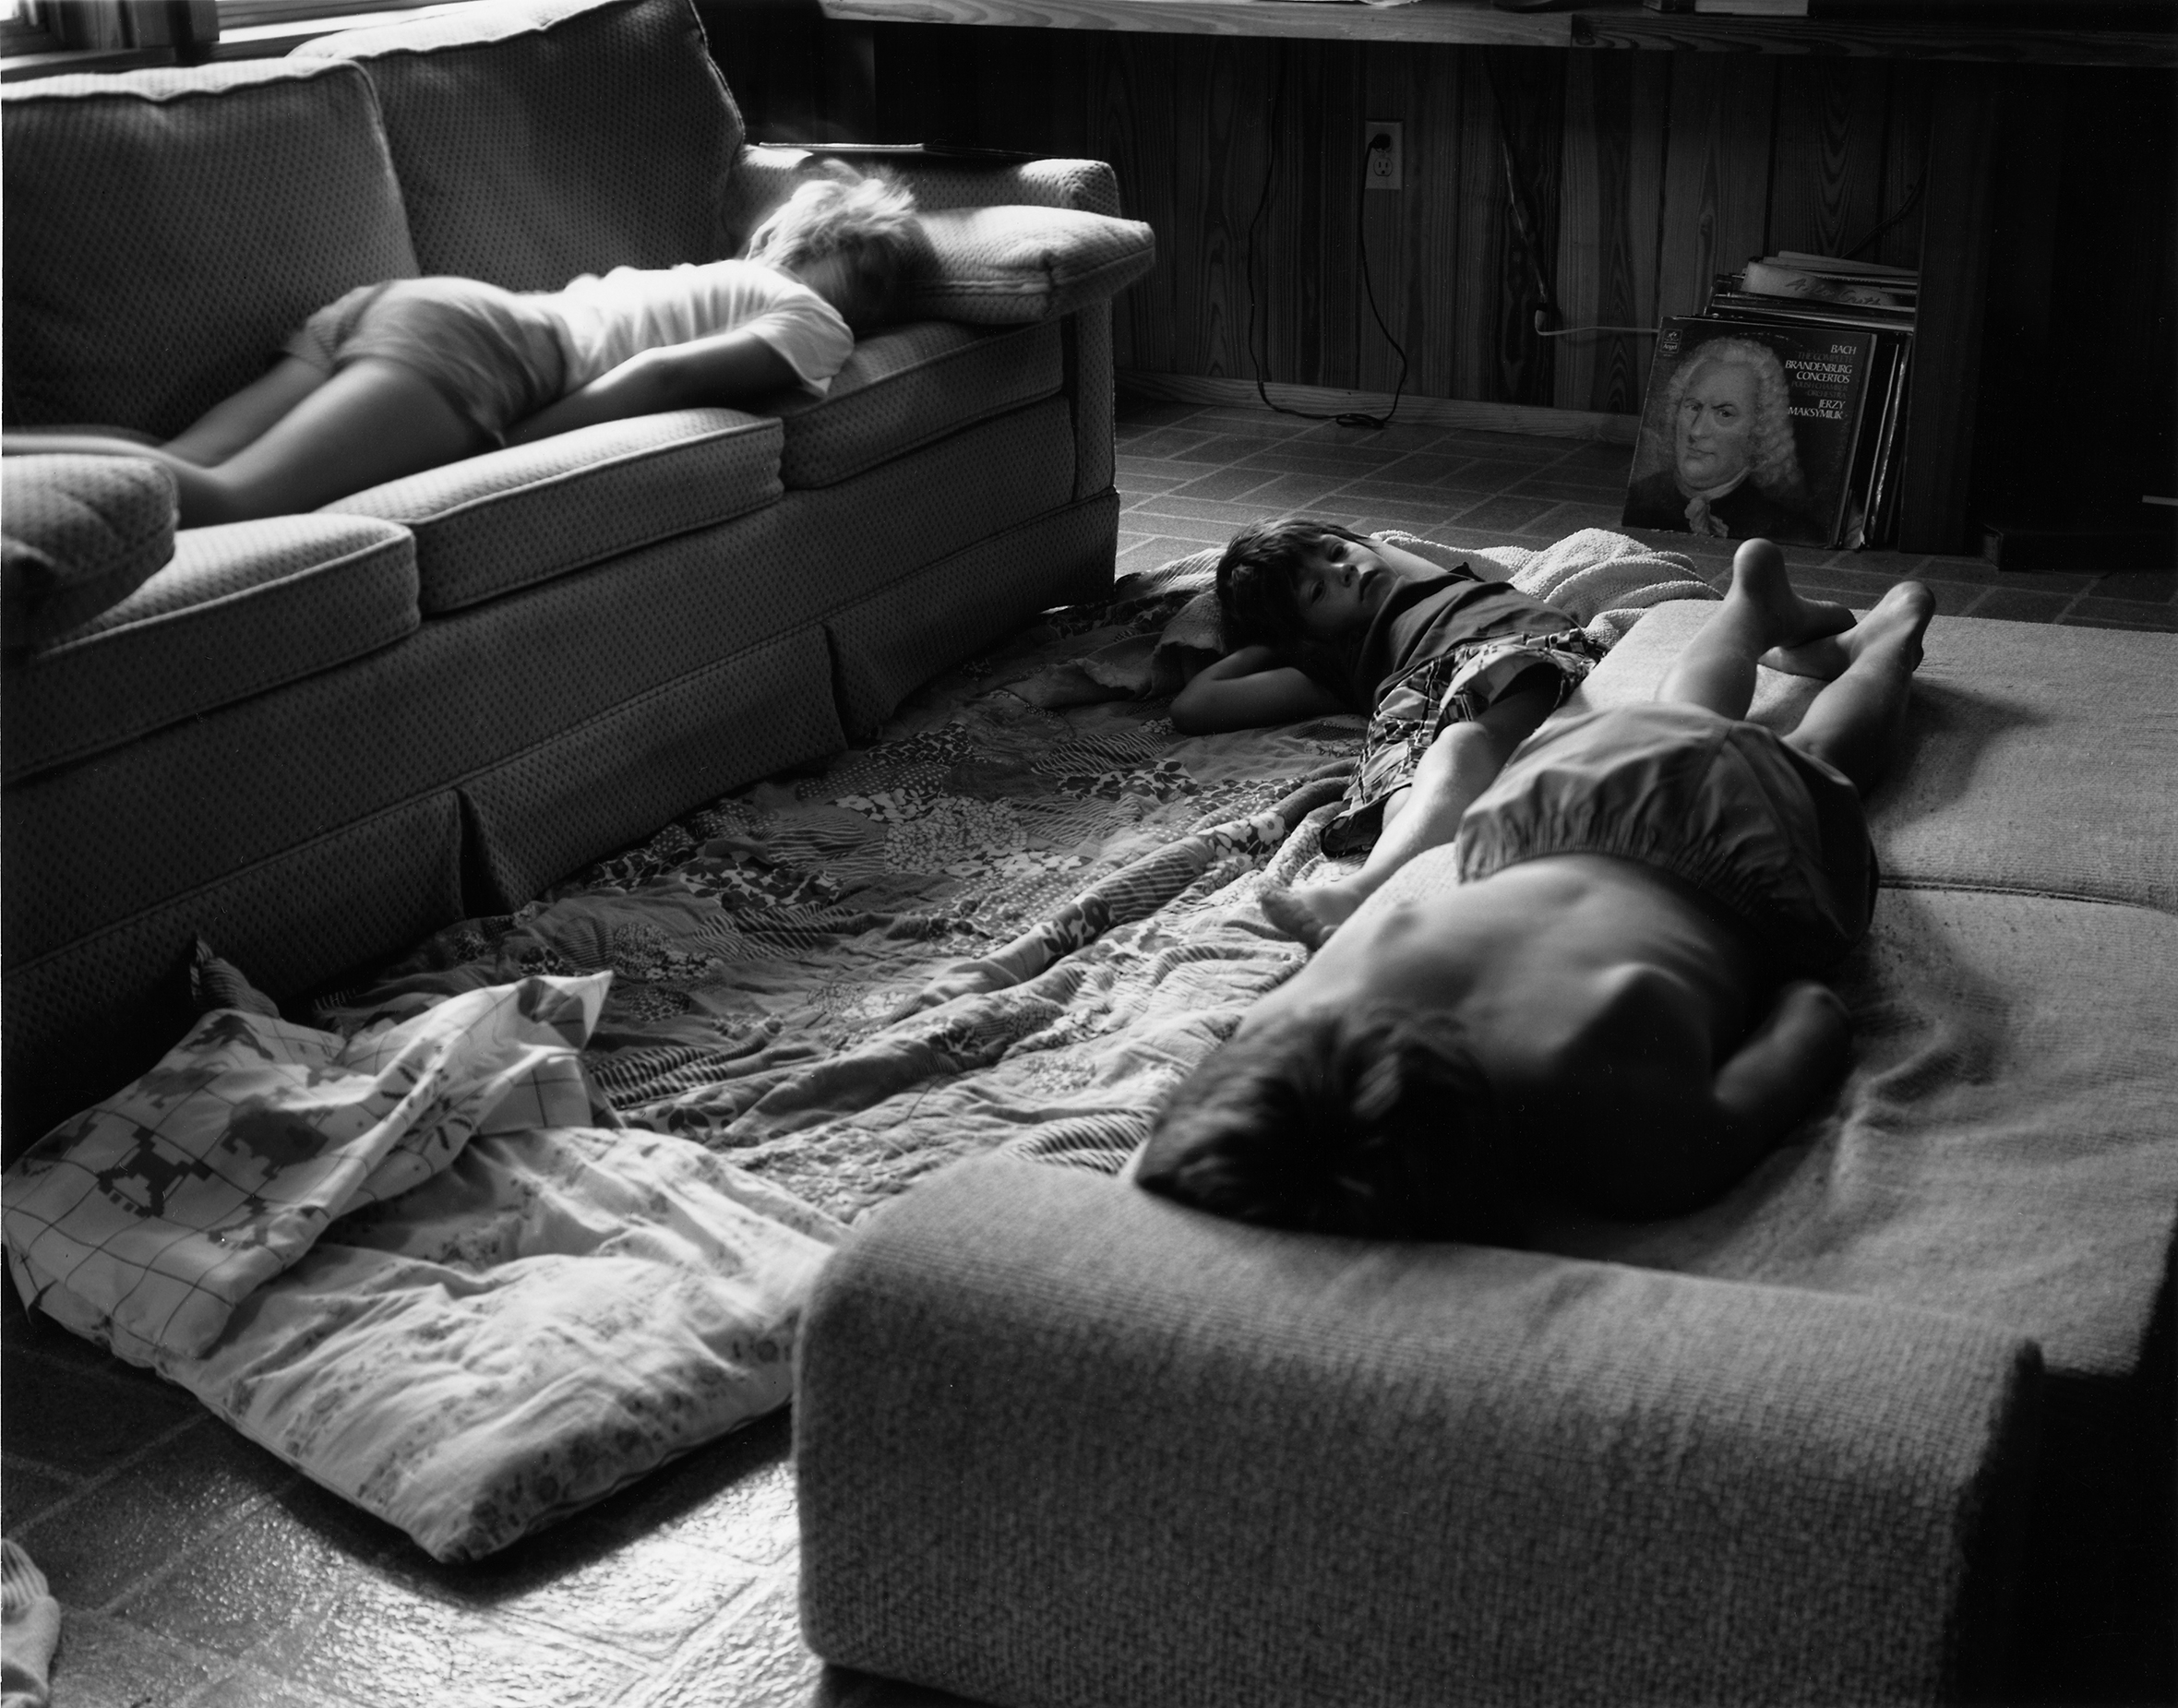 483 - Koplitz - The Sofa